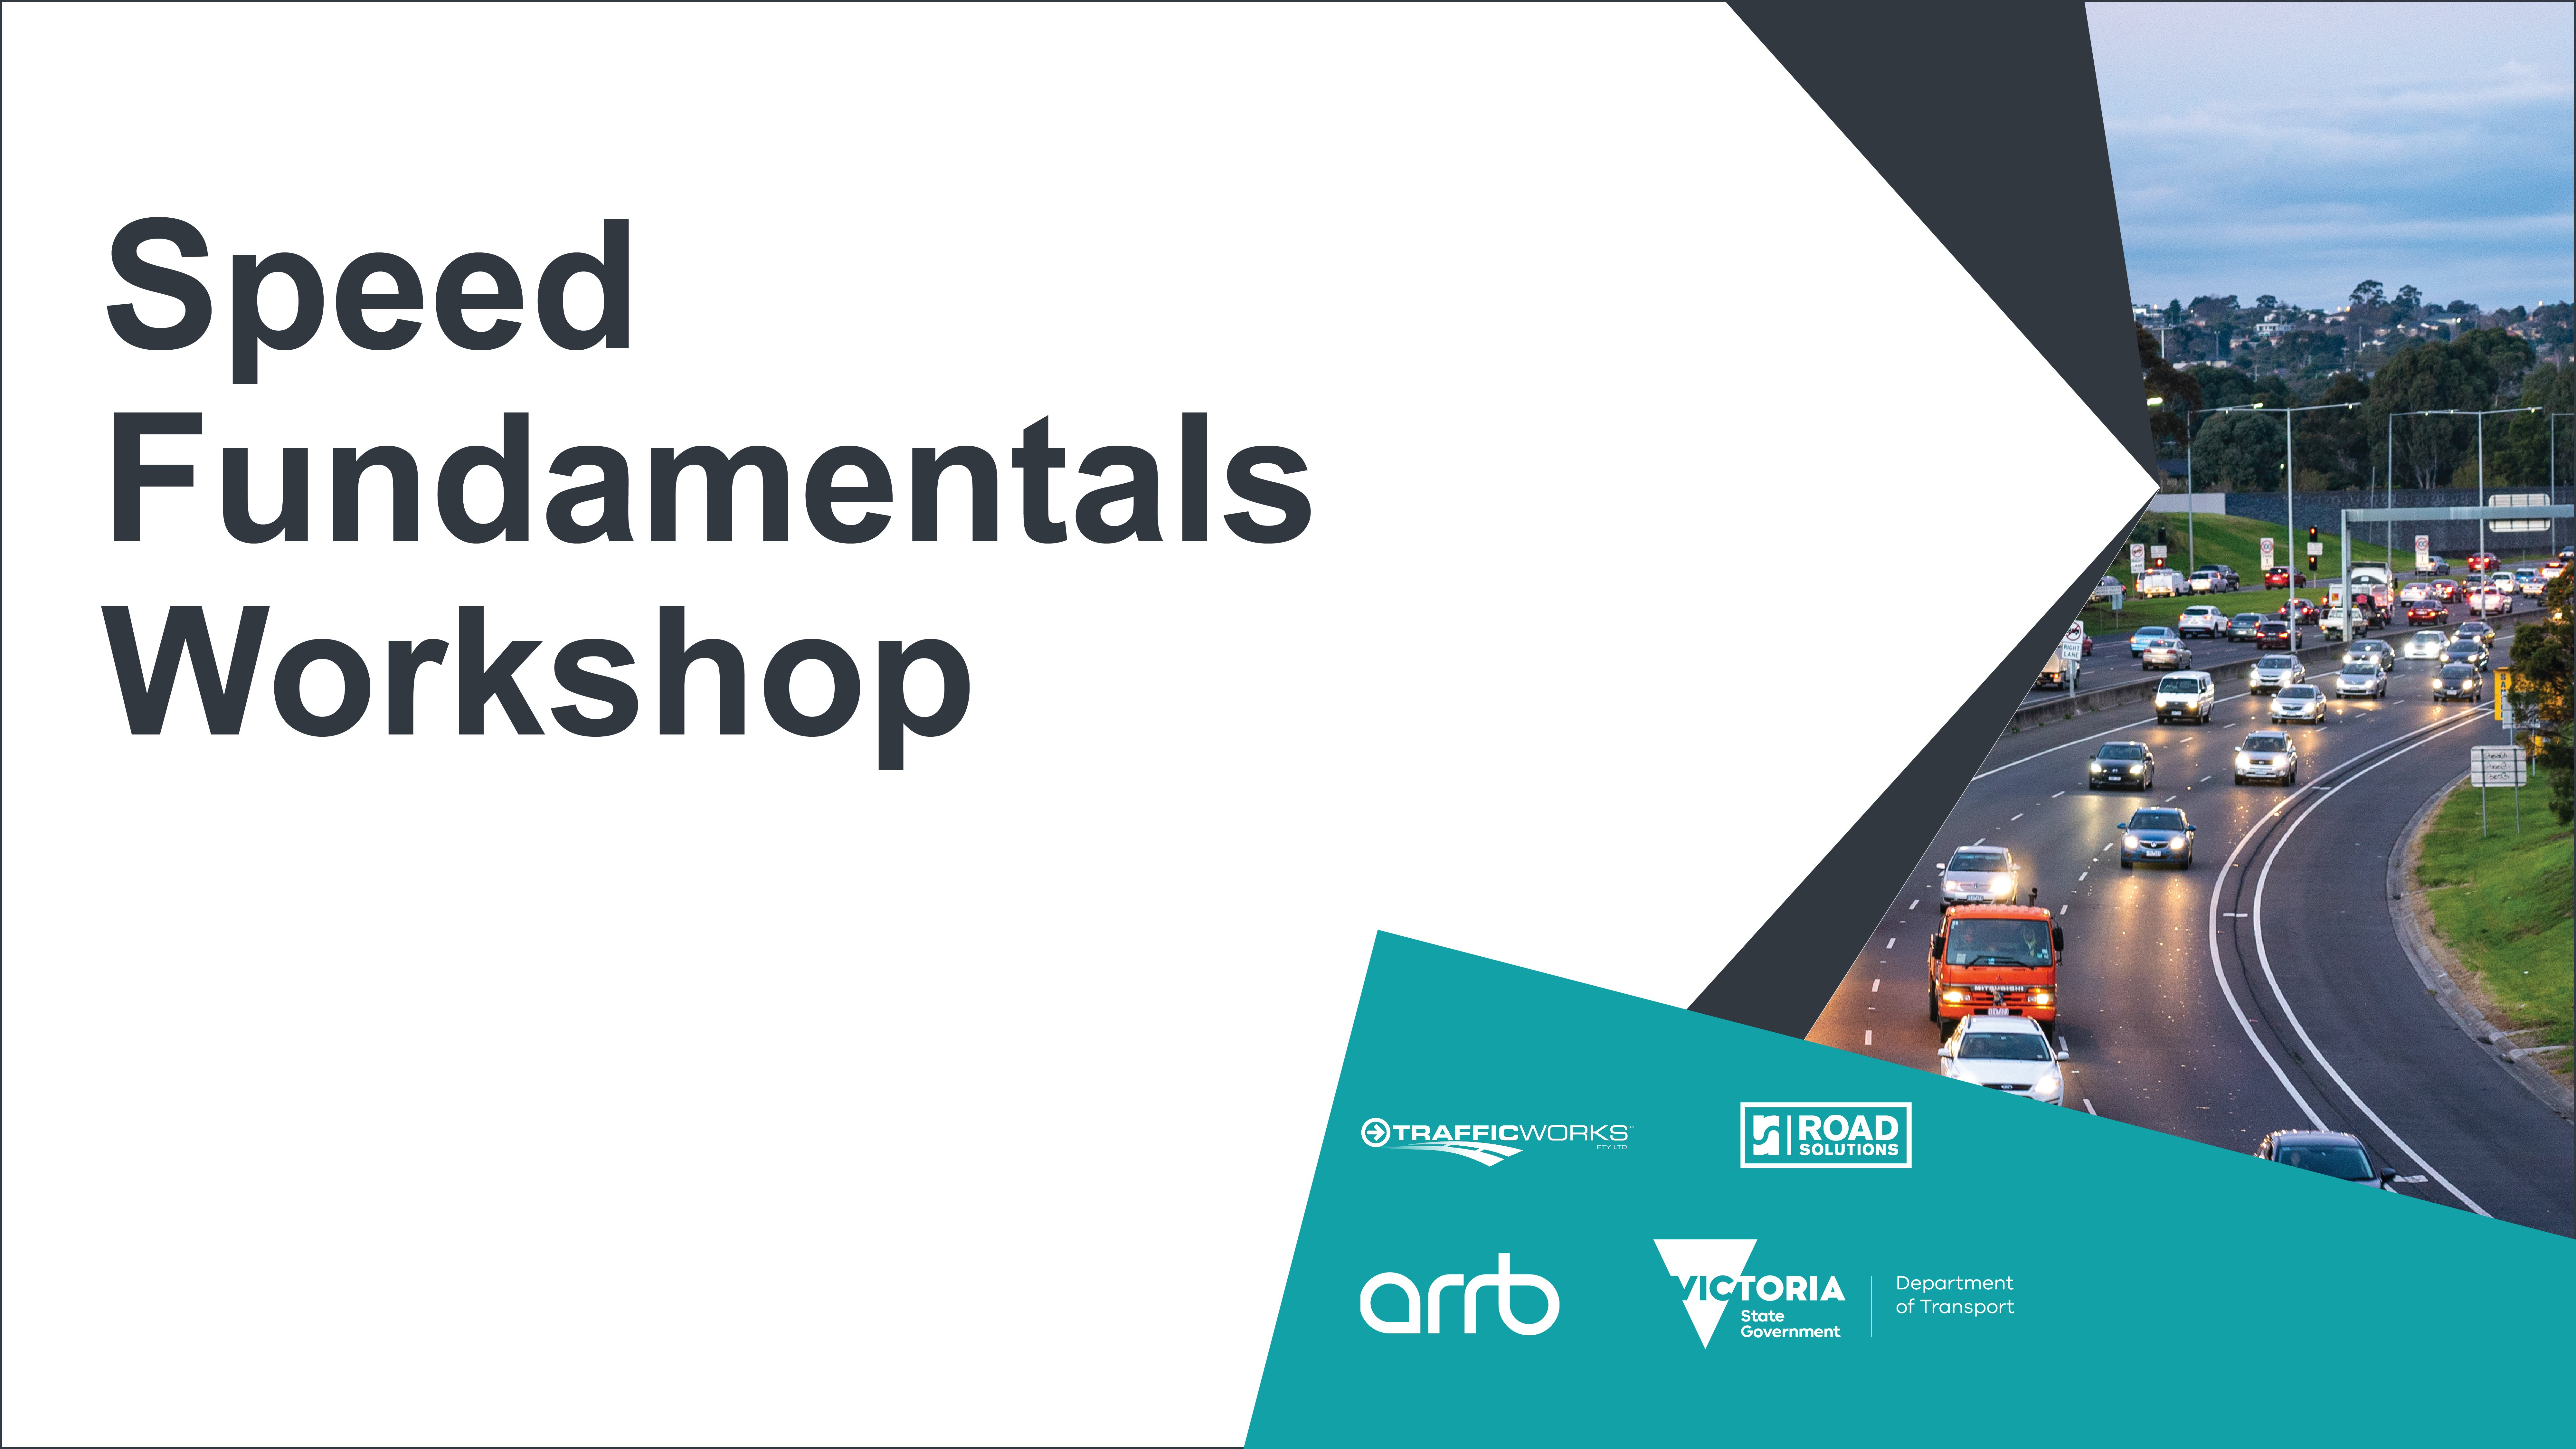 DoT Speed Fundamentals Workshop December